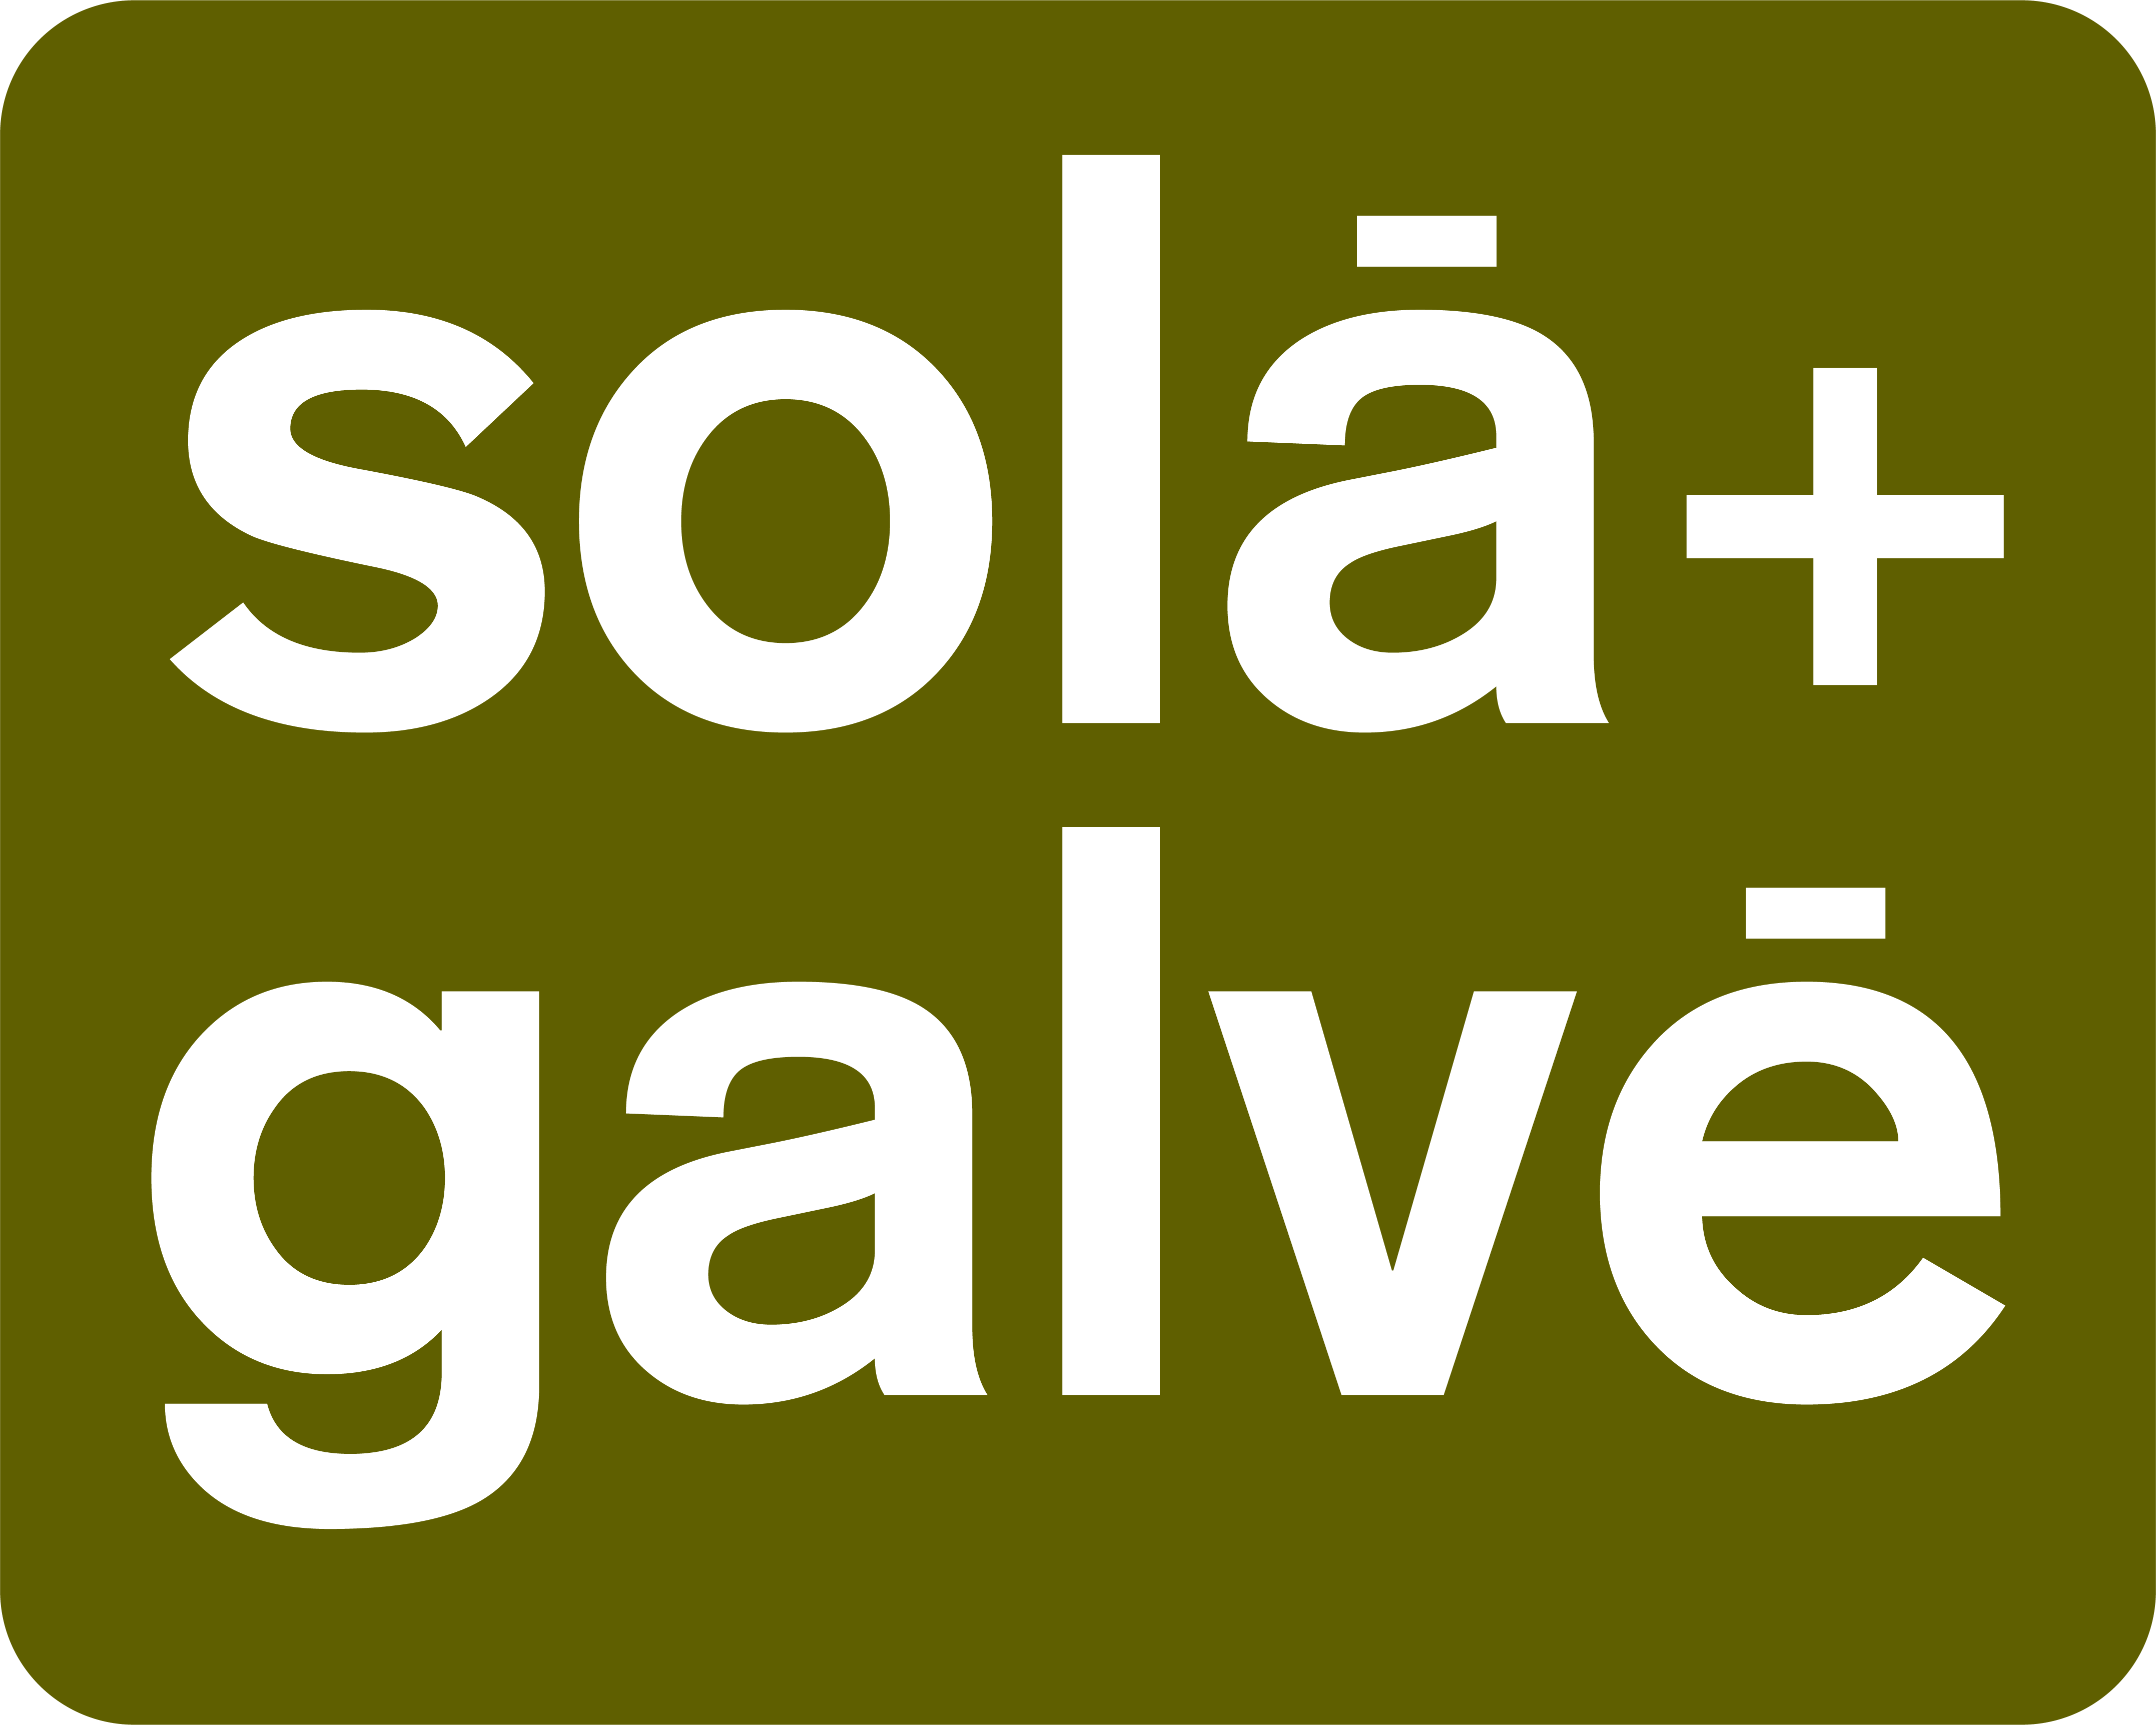 Sola Galve - Bigle Legal